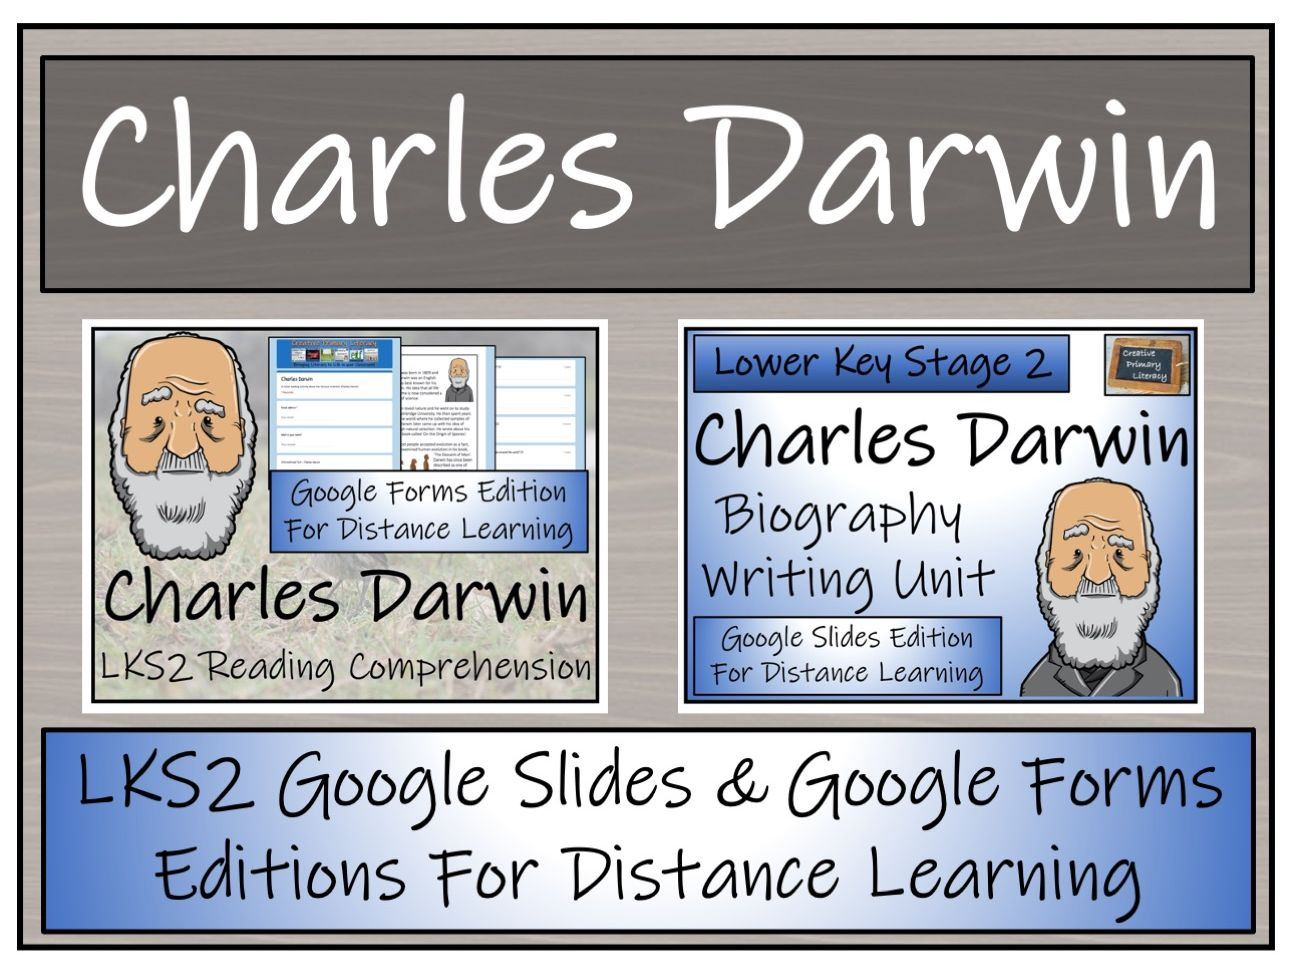 LKS2 Charles Darwin Biography & Reading Comprehension Distance Learning Bundle